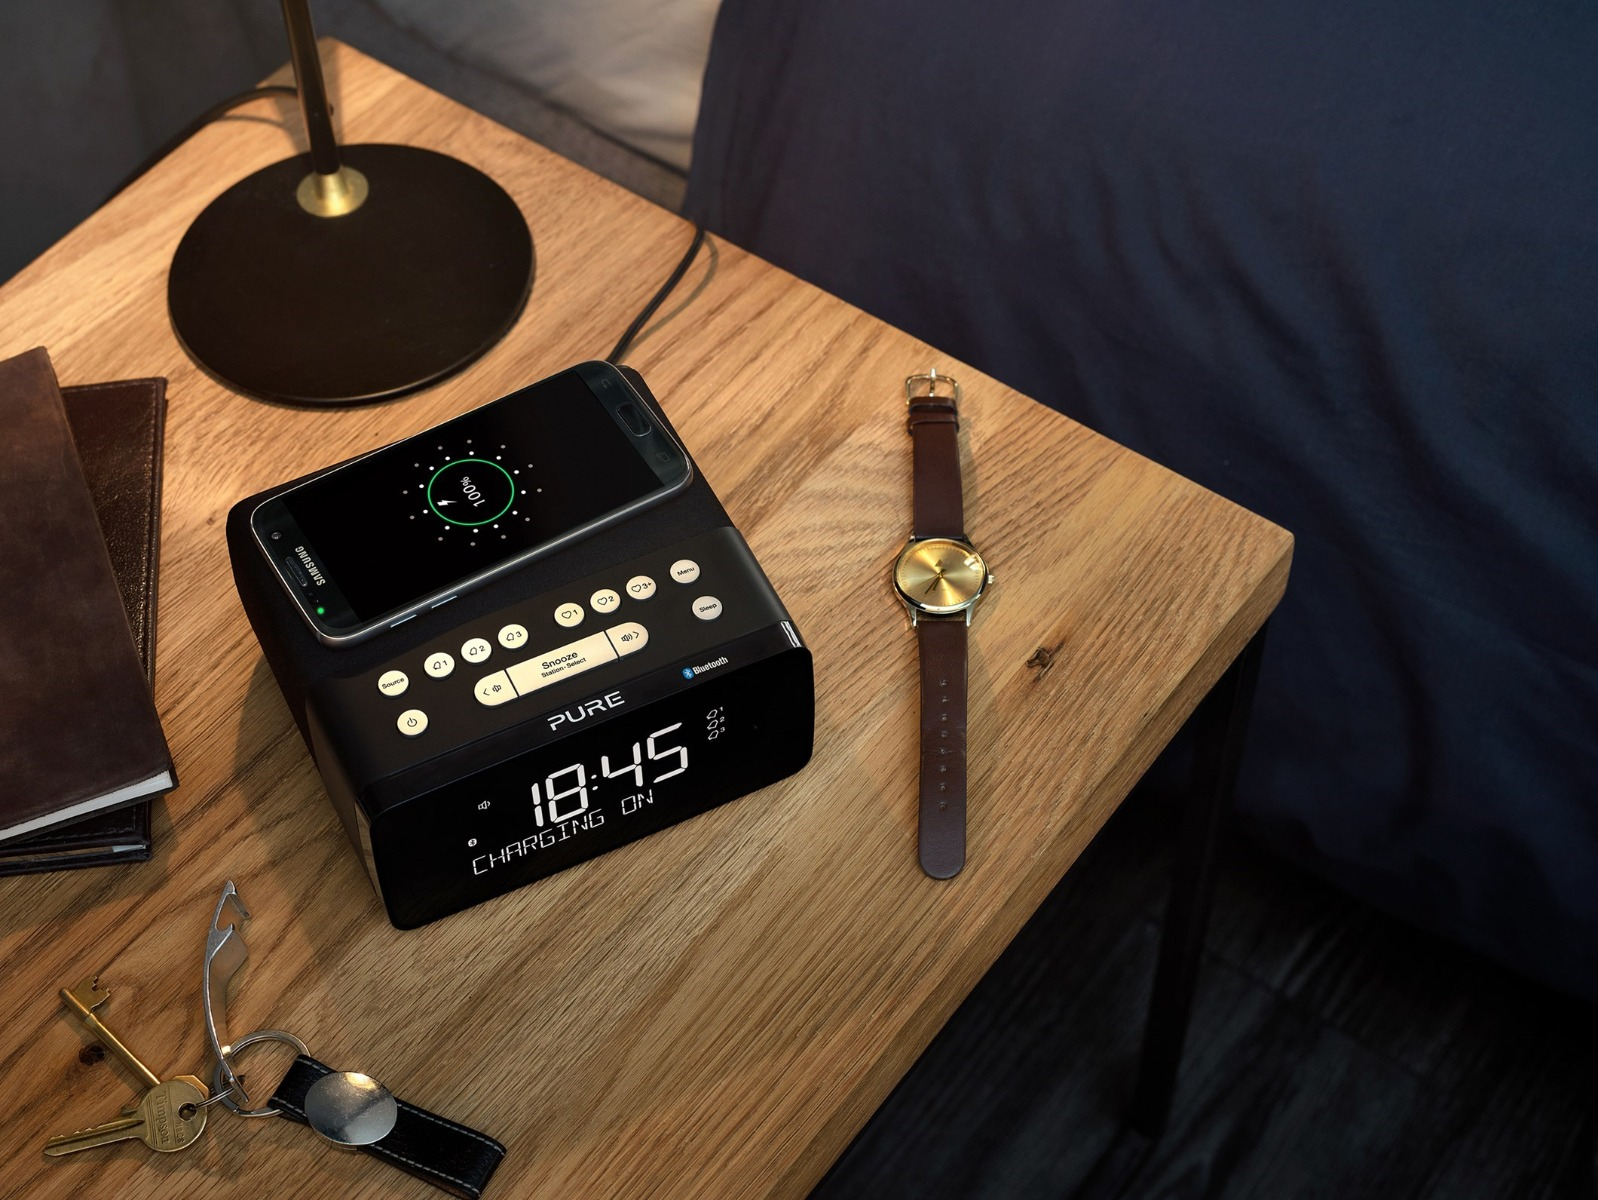 Pure siesta charge | te koop bij audiogigant